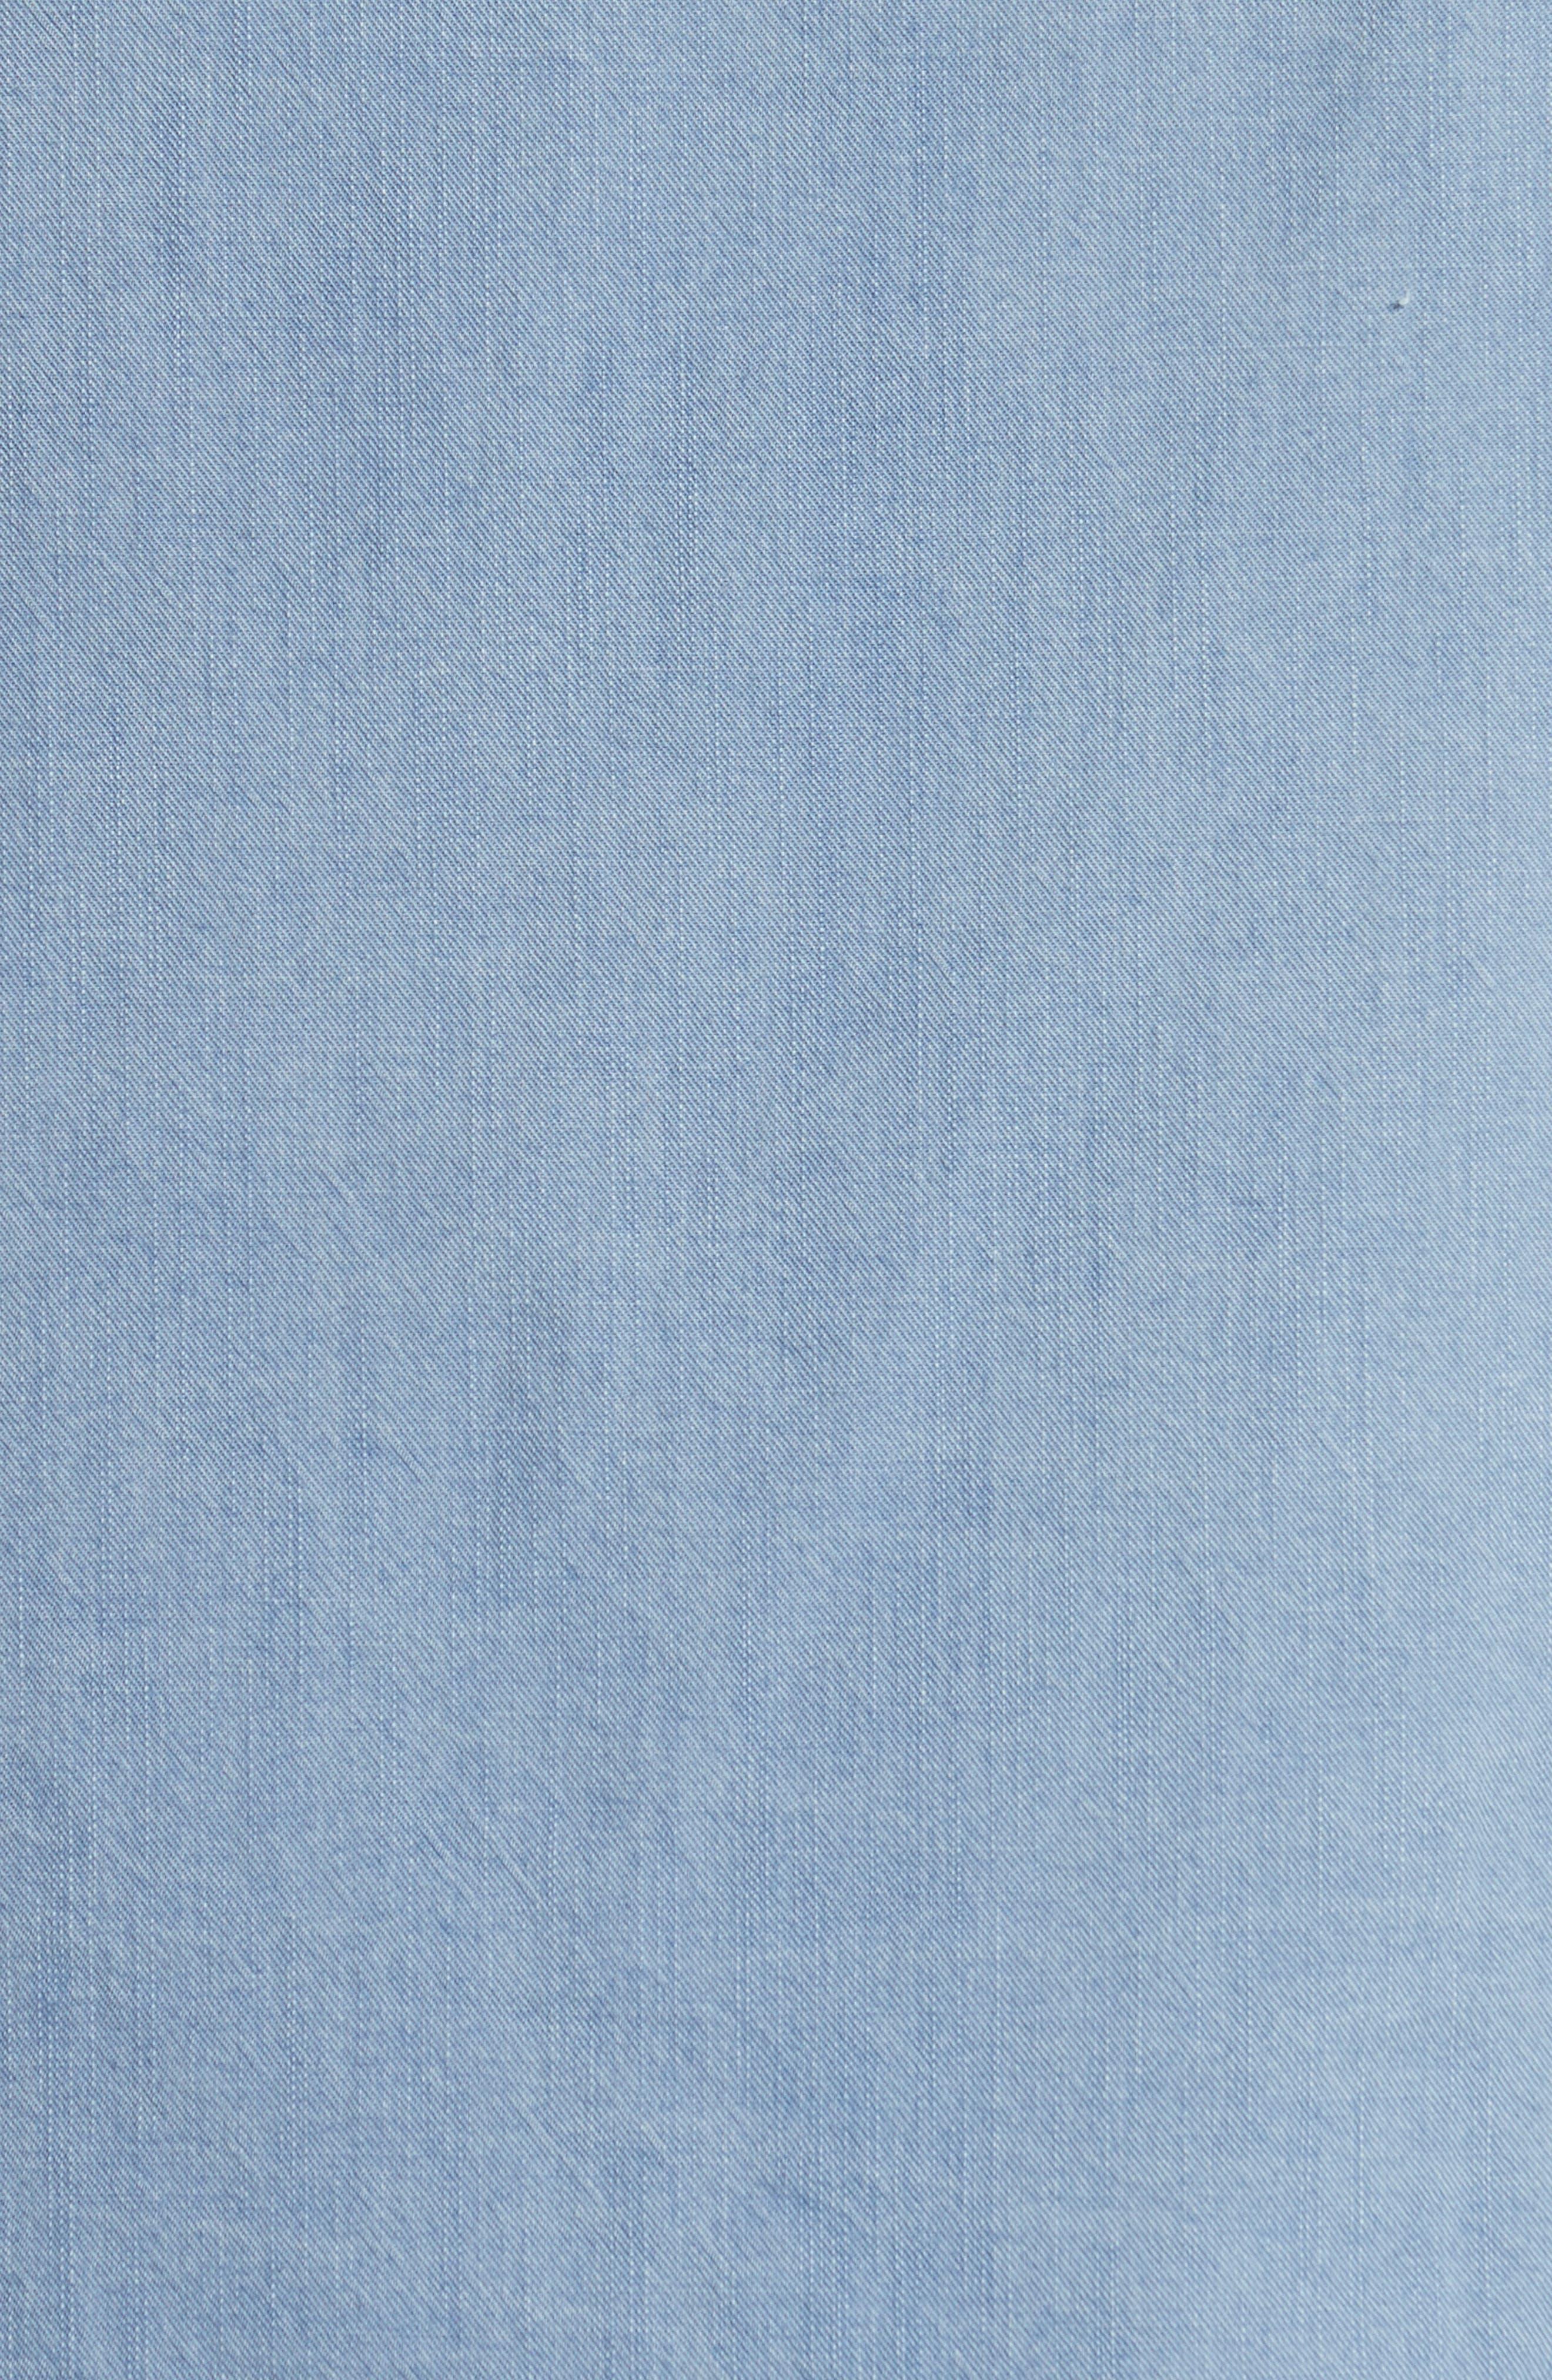 Napoli Washed Denim Band Collar Shirt,                             Alternate thumbnail 5, color,                             451